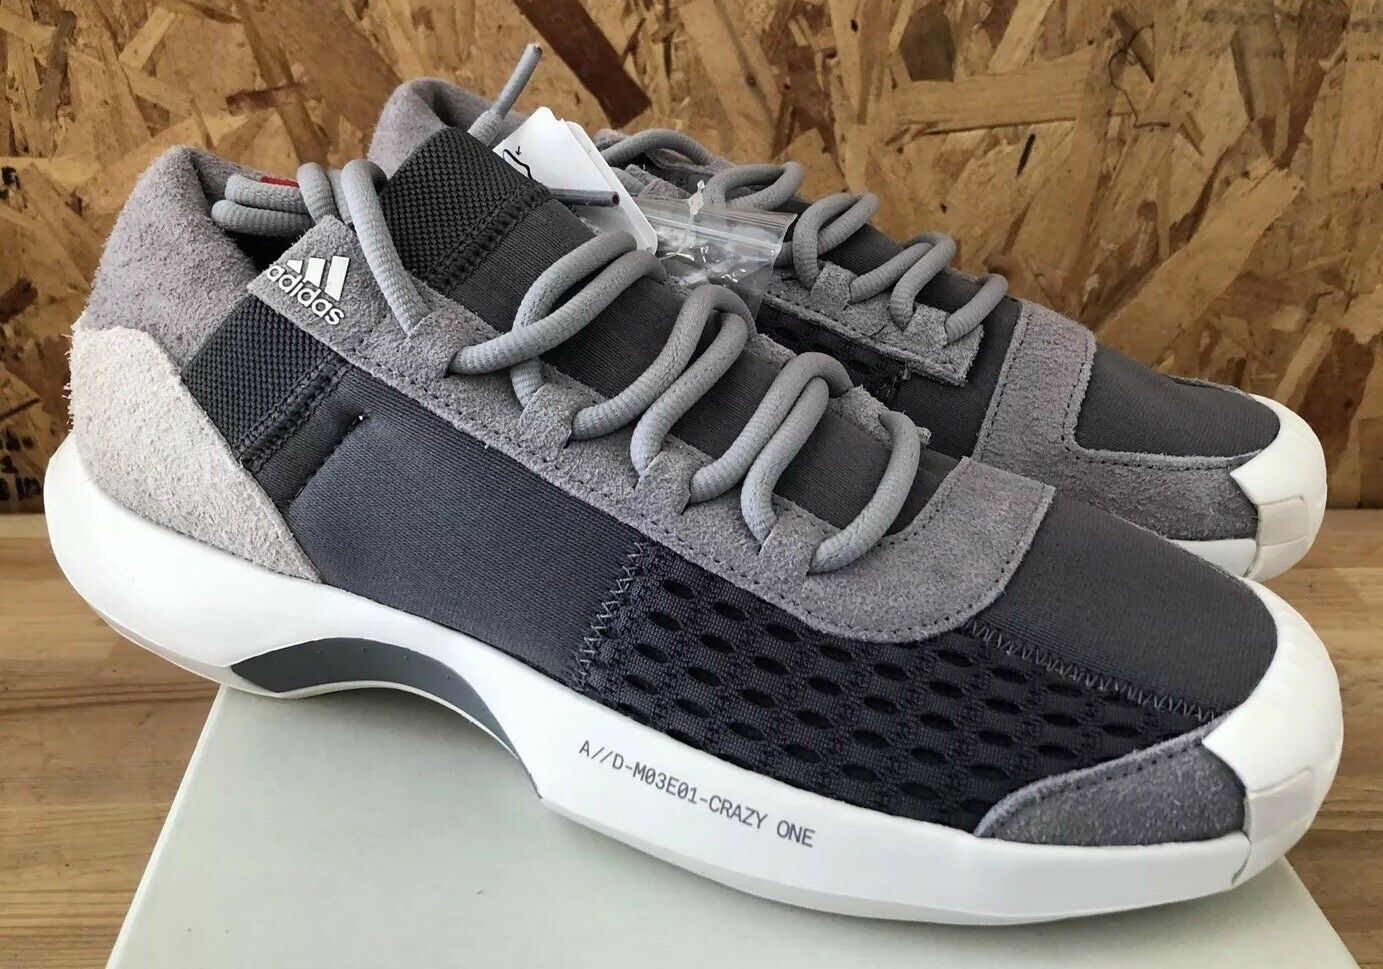 Adidas A Crazy 1 A Adidas D CQ1868 Grey White Red Sz 9.5 NIB c5936c